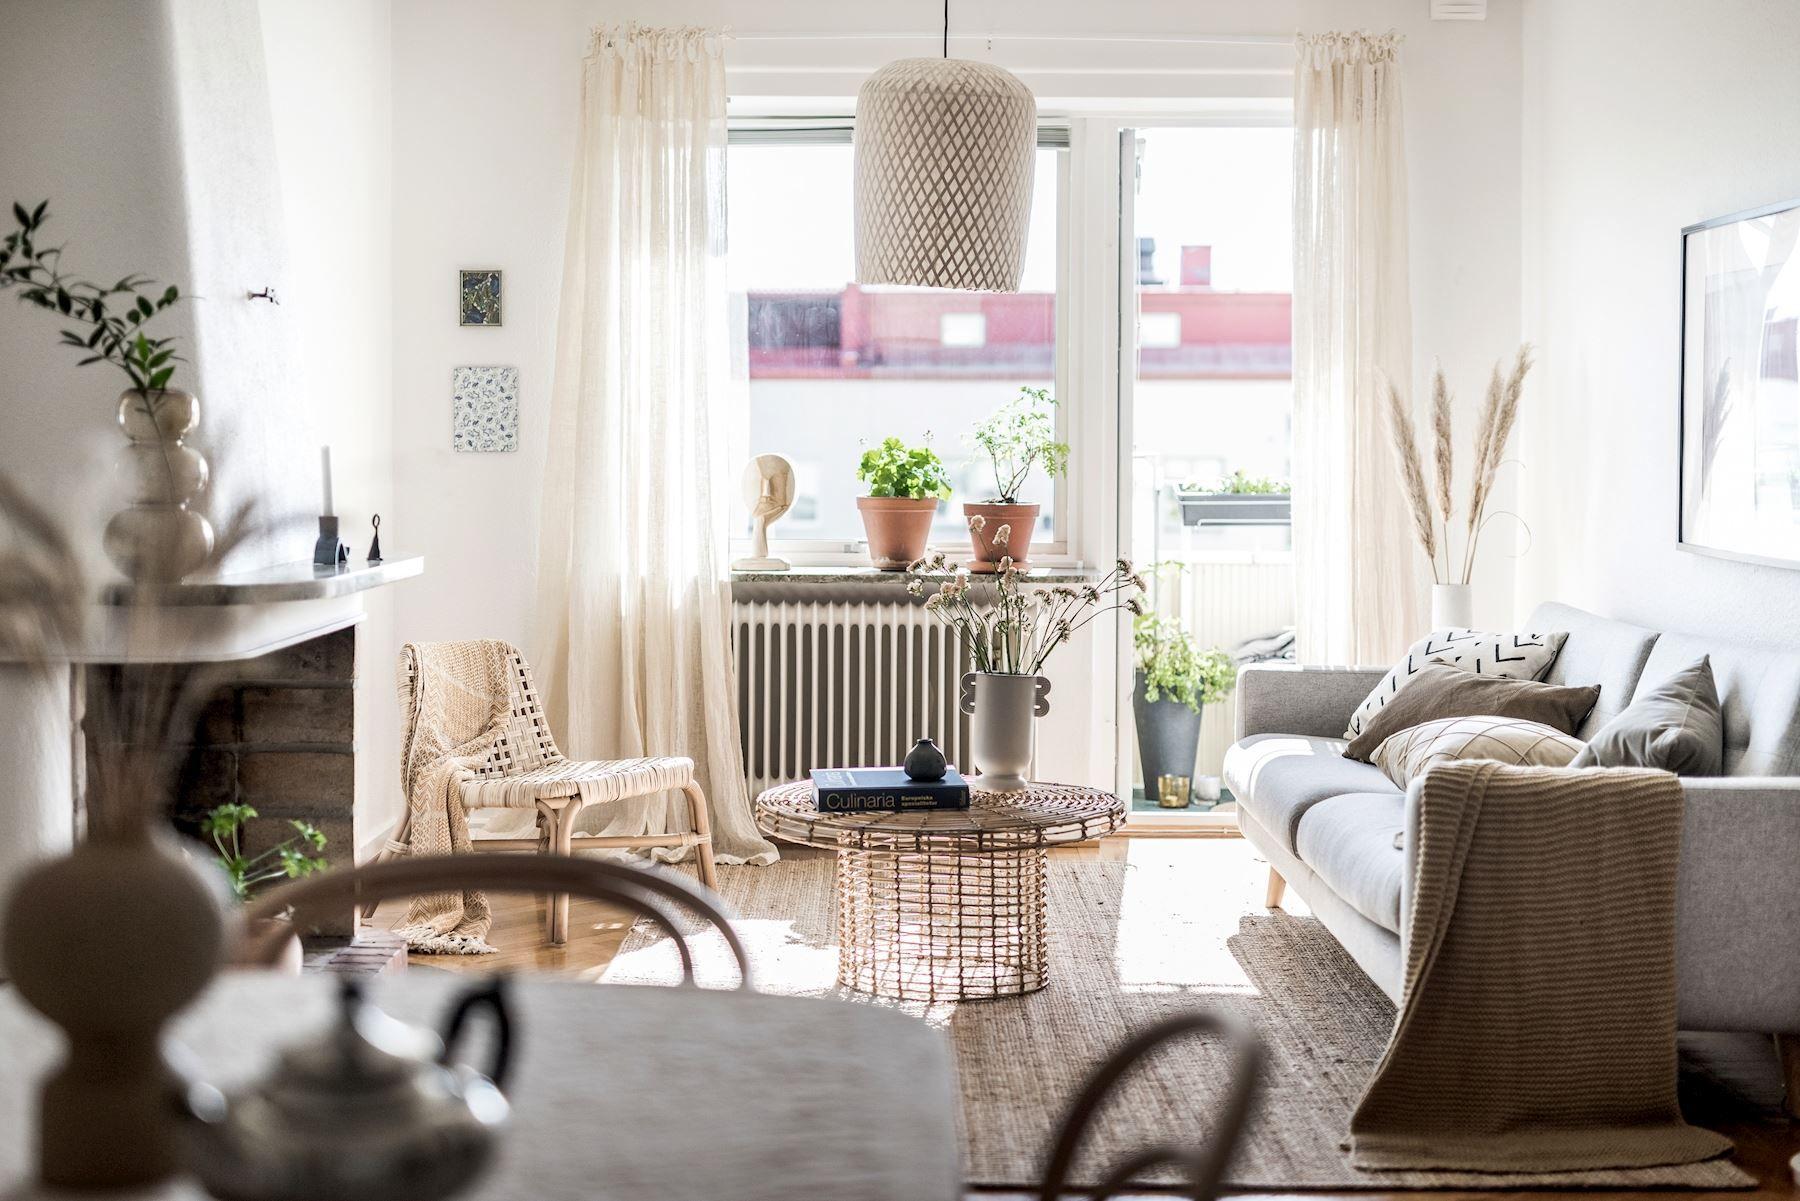 Spaldingsgatan 7 Vstra Gtalands ln, Gteborg - garagesale24.net